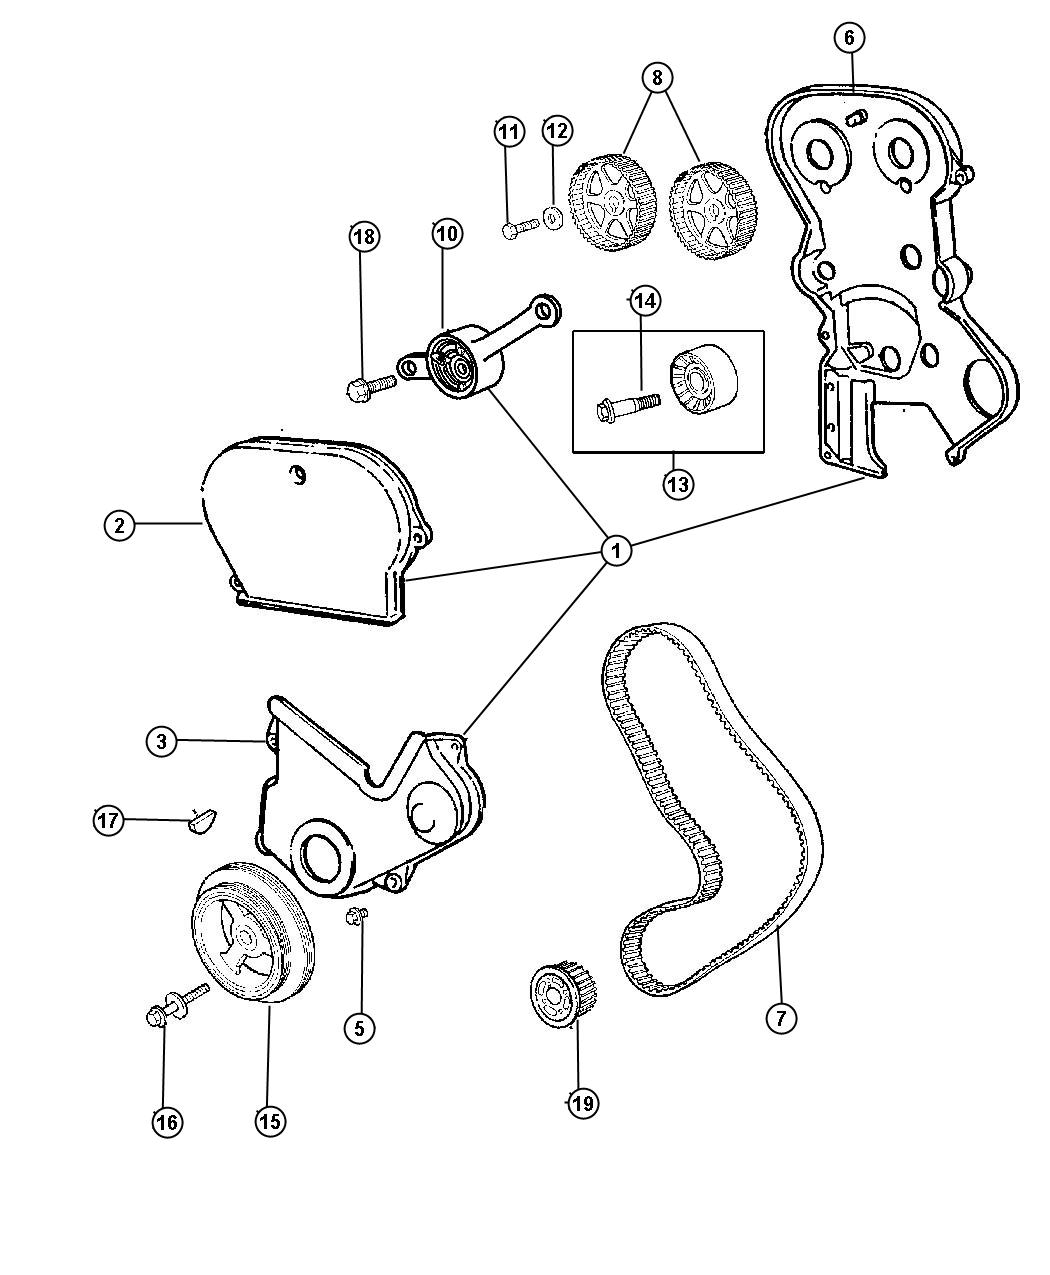 Chrysler Town & Country Damper. Engine vibration. Ecm